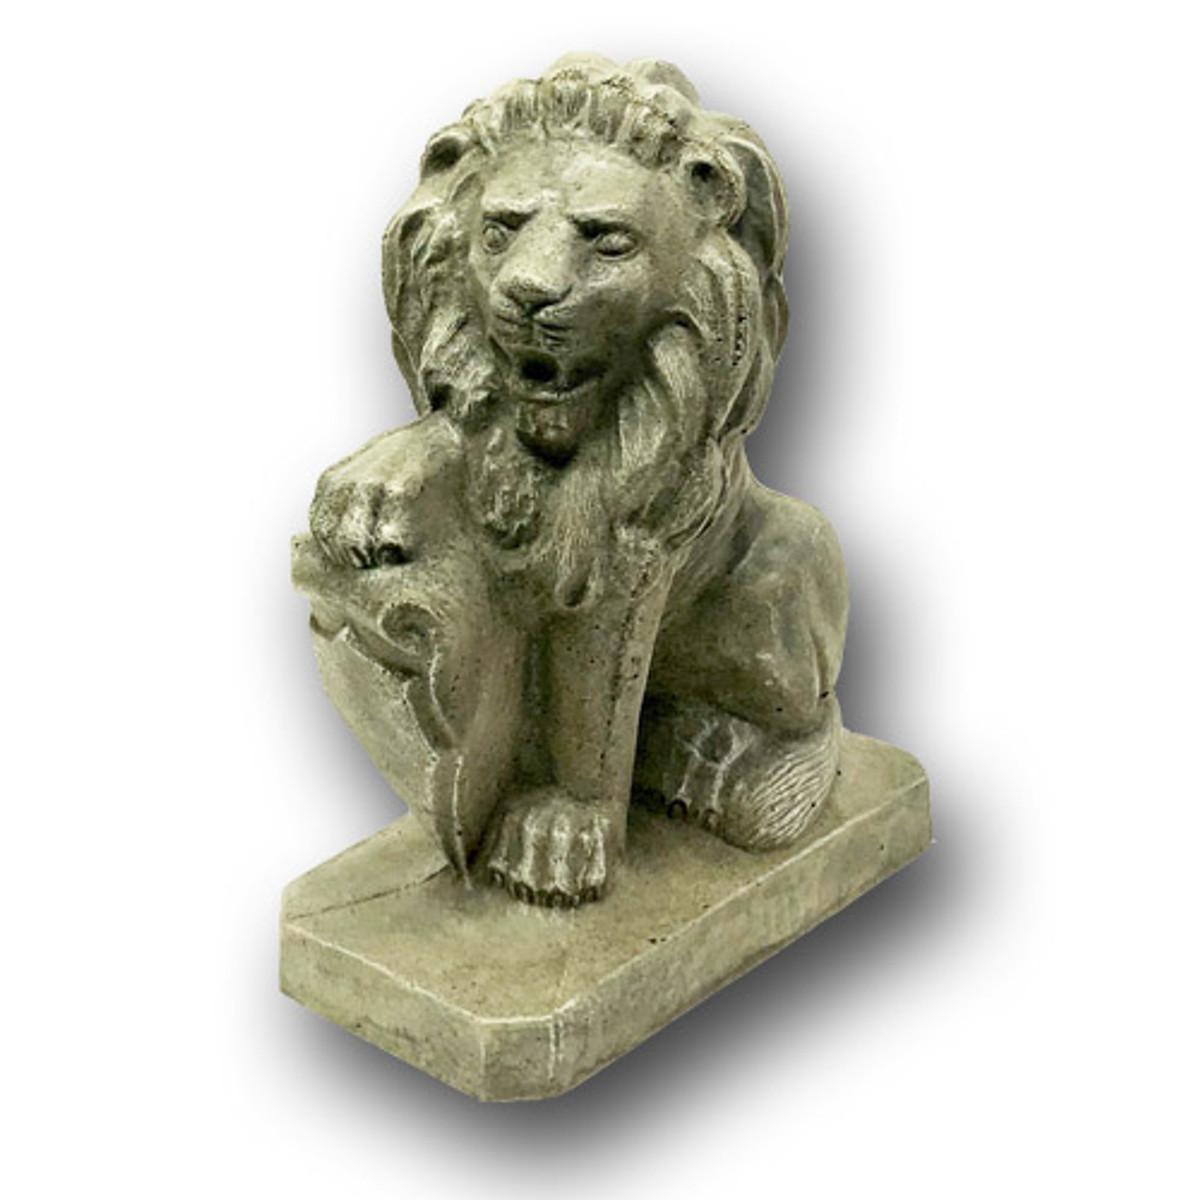 BR-010 Right Concrete Lion Shield